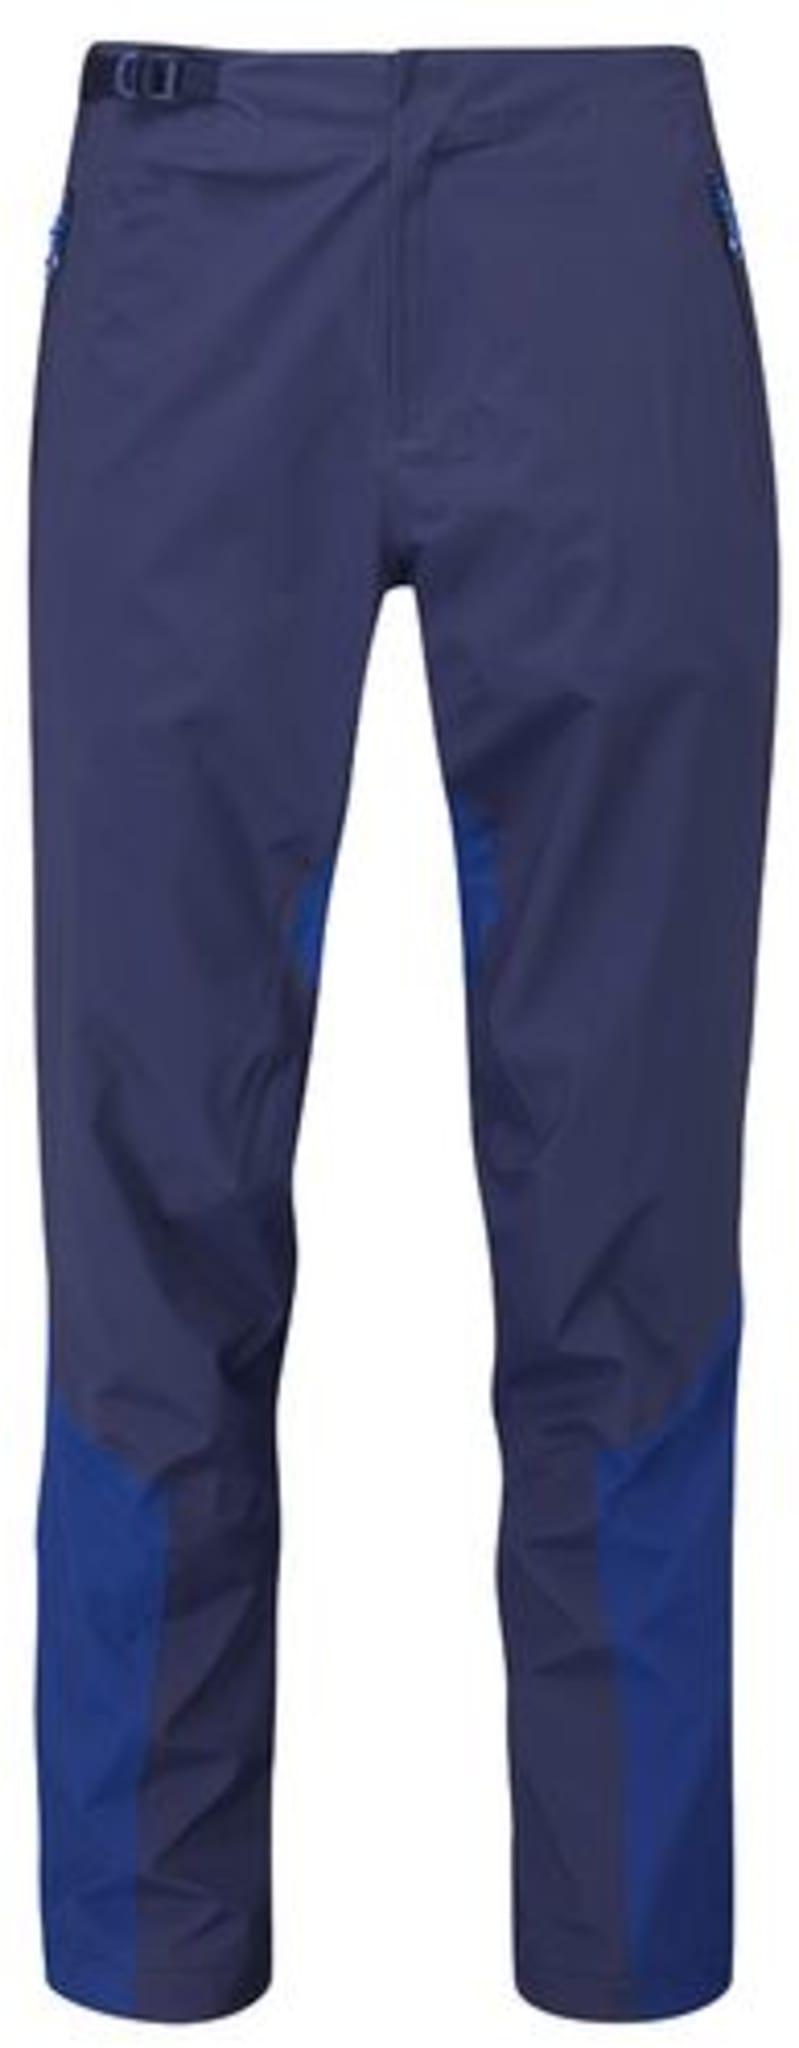 Kinetic 2.0 Pants Ms